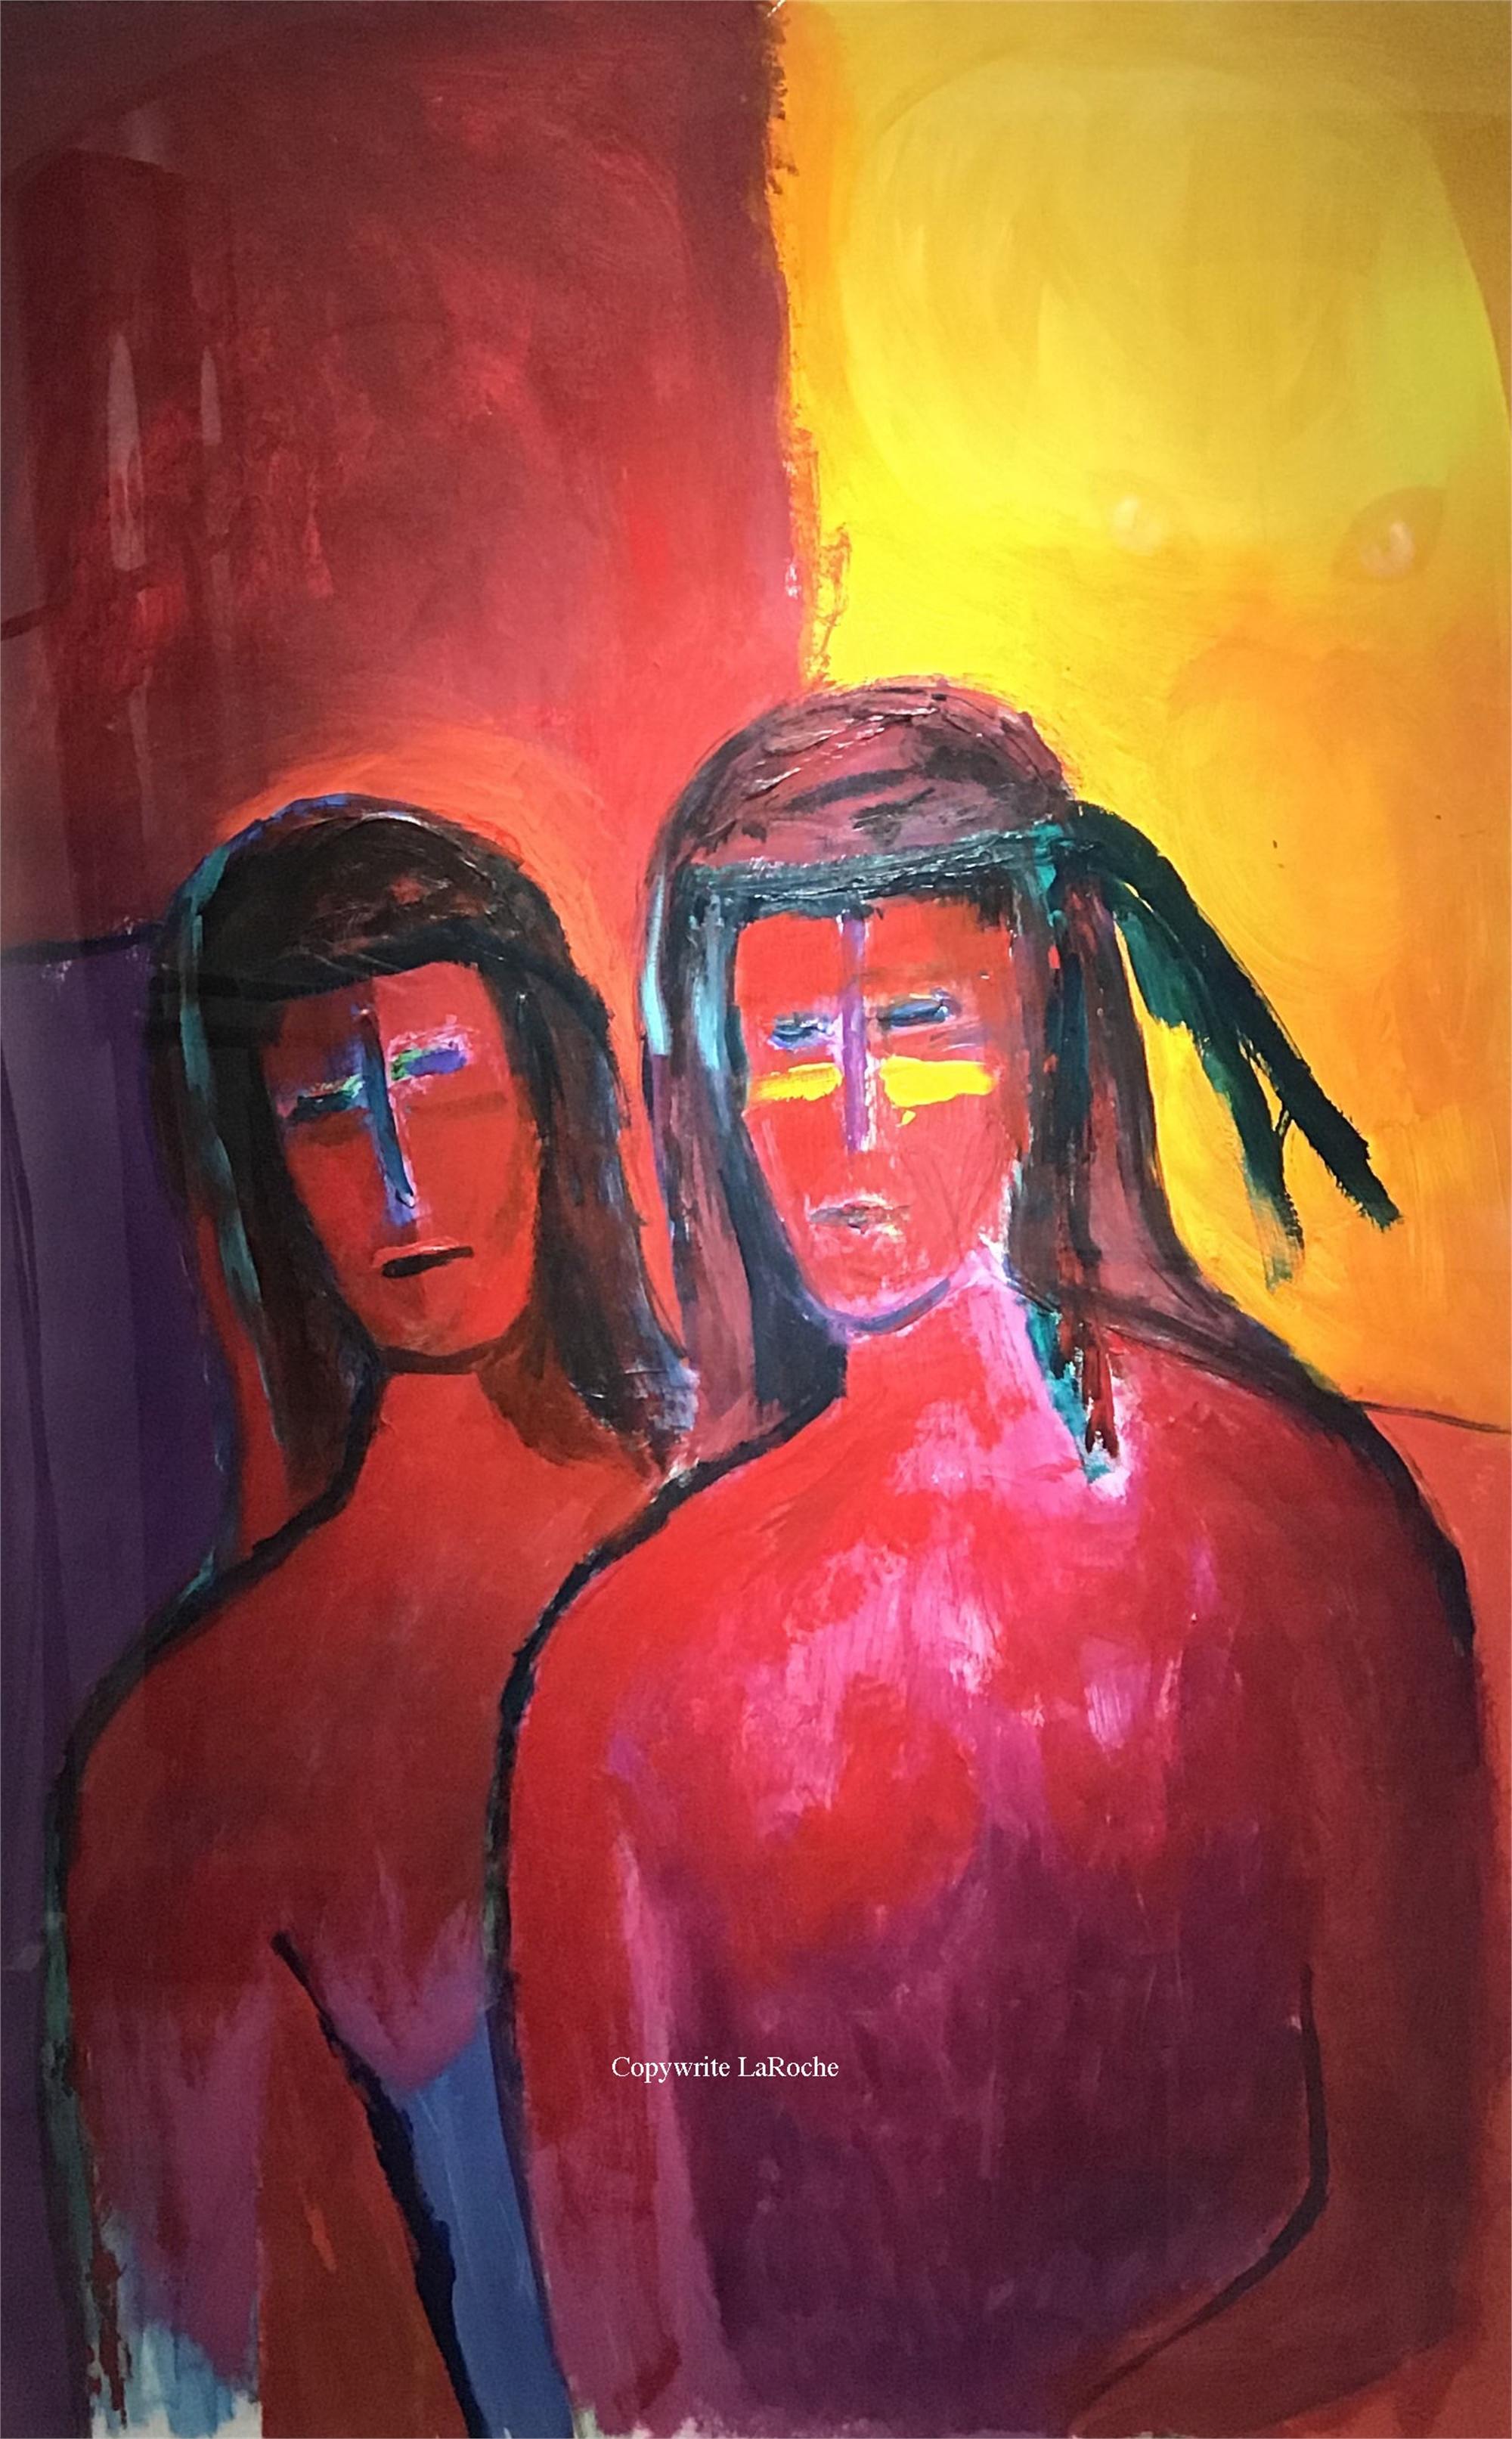 MOON AND SUN WARRIORS by Carole LaRoche